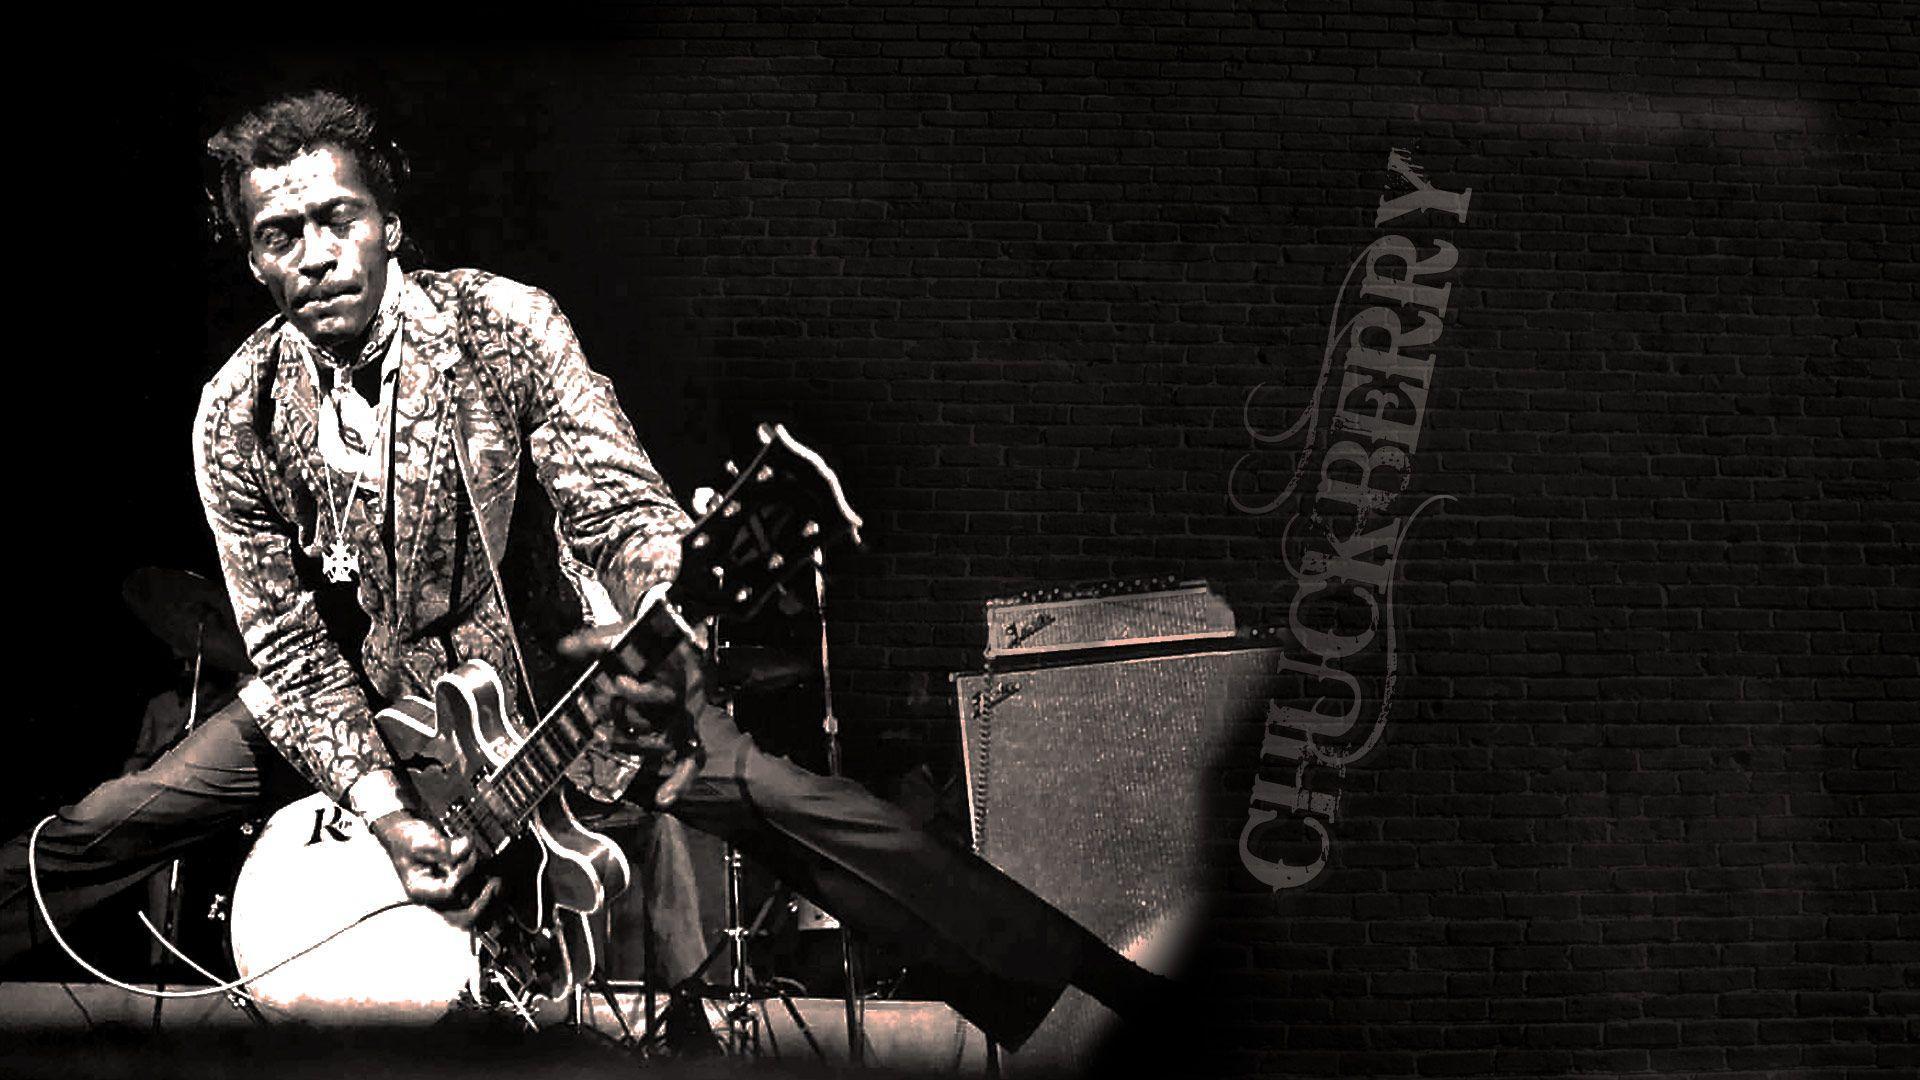 Chuck Berry HD Wallpapers for desktop download